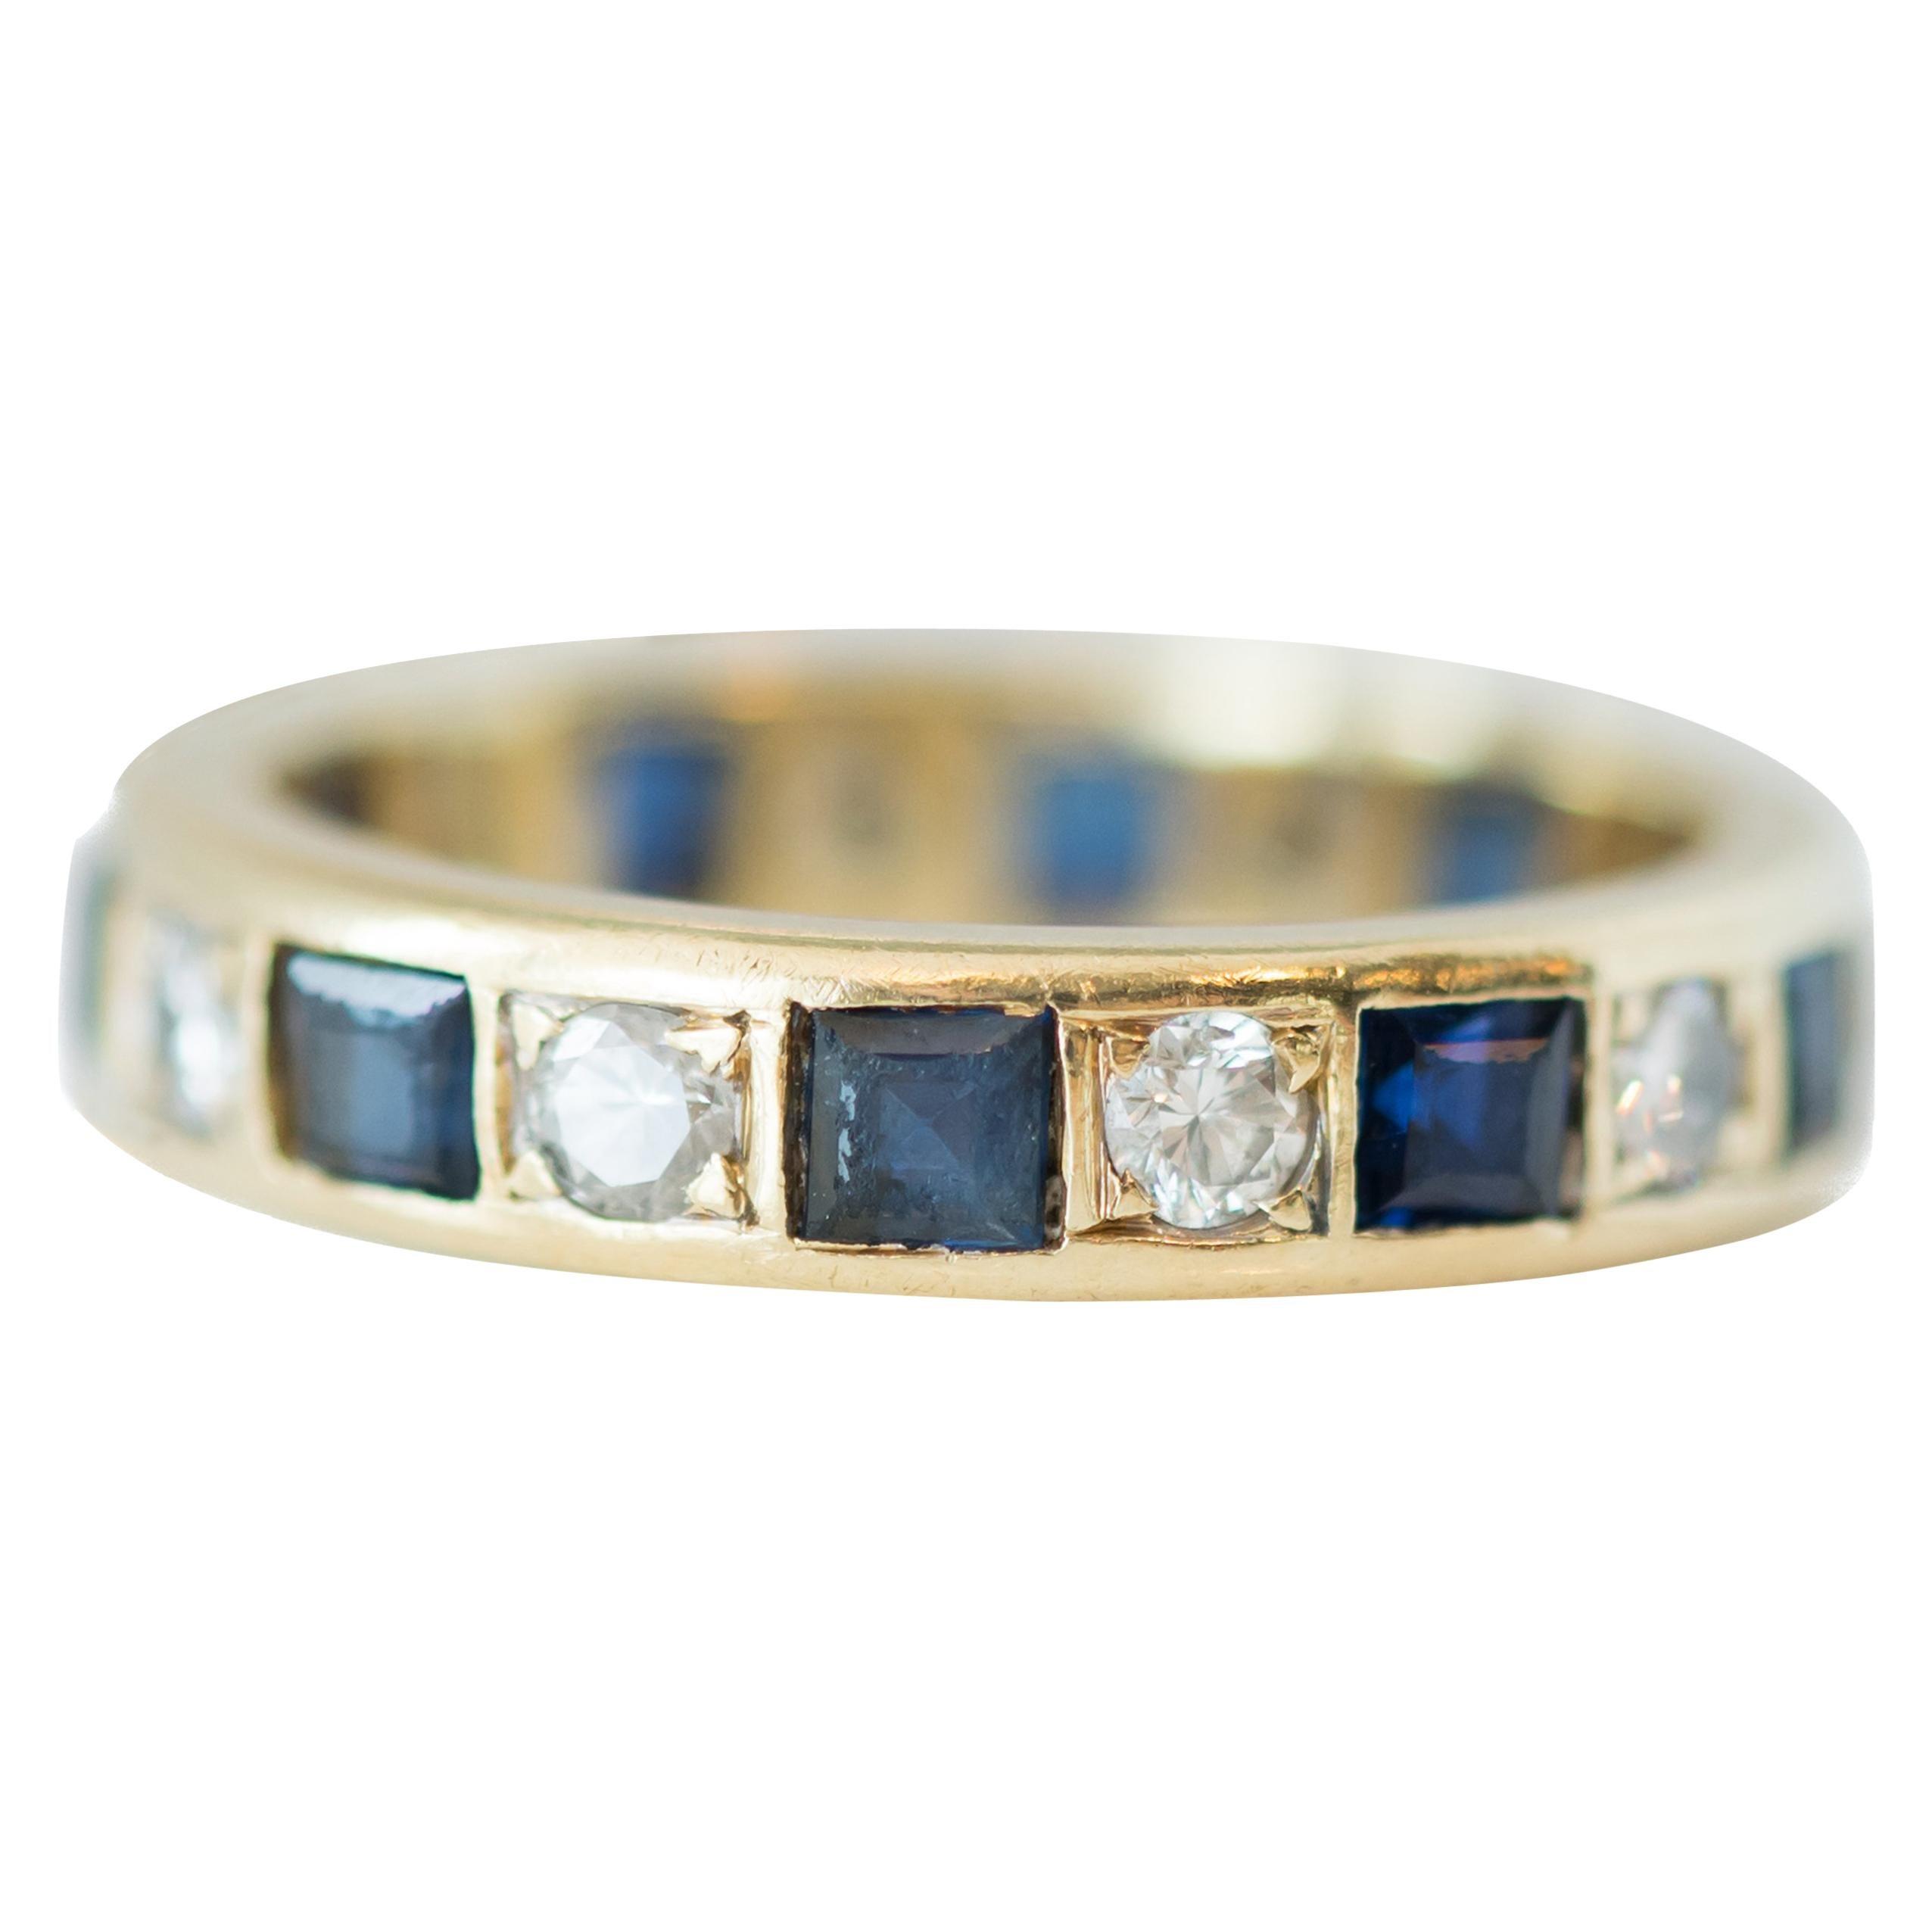 1950s Sapphire and Diamond 14 Karat Yellow Gold Eternity Band